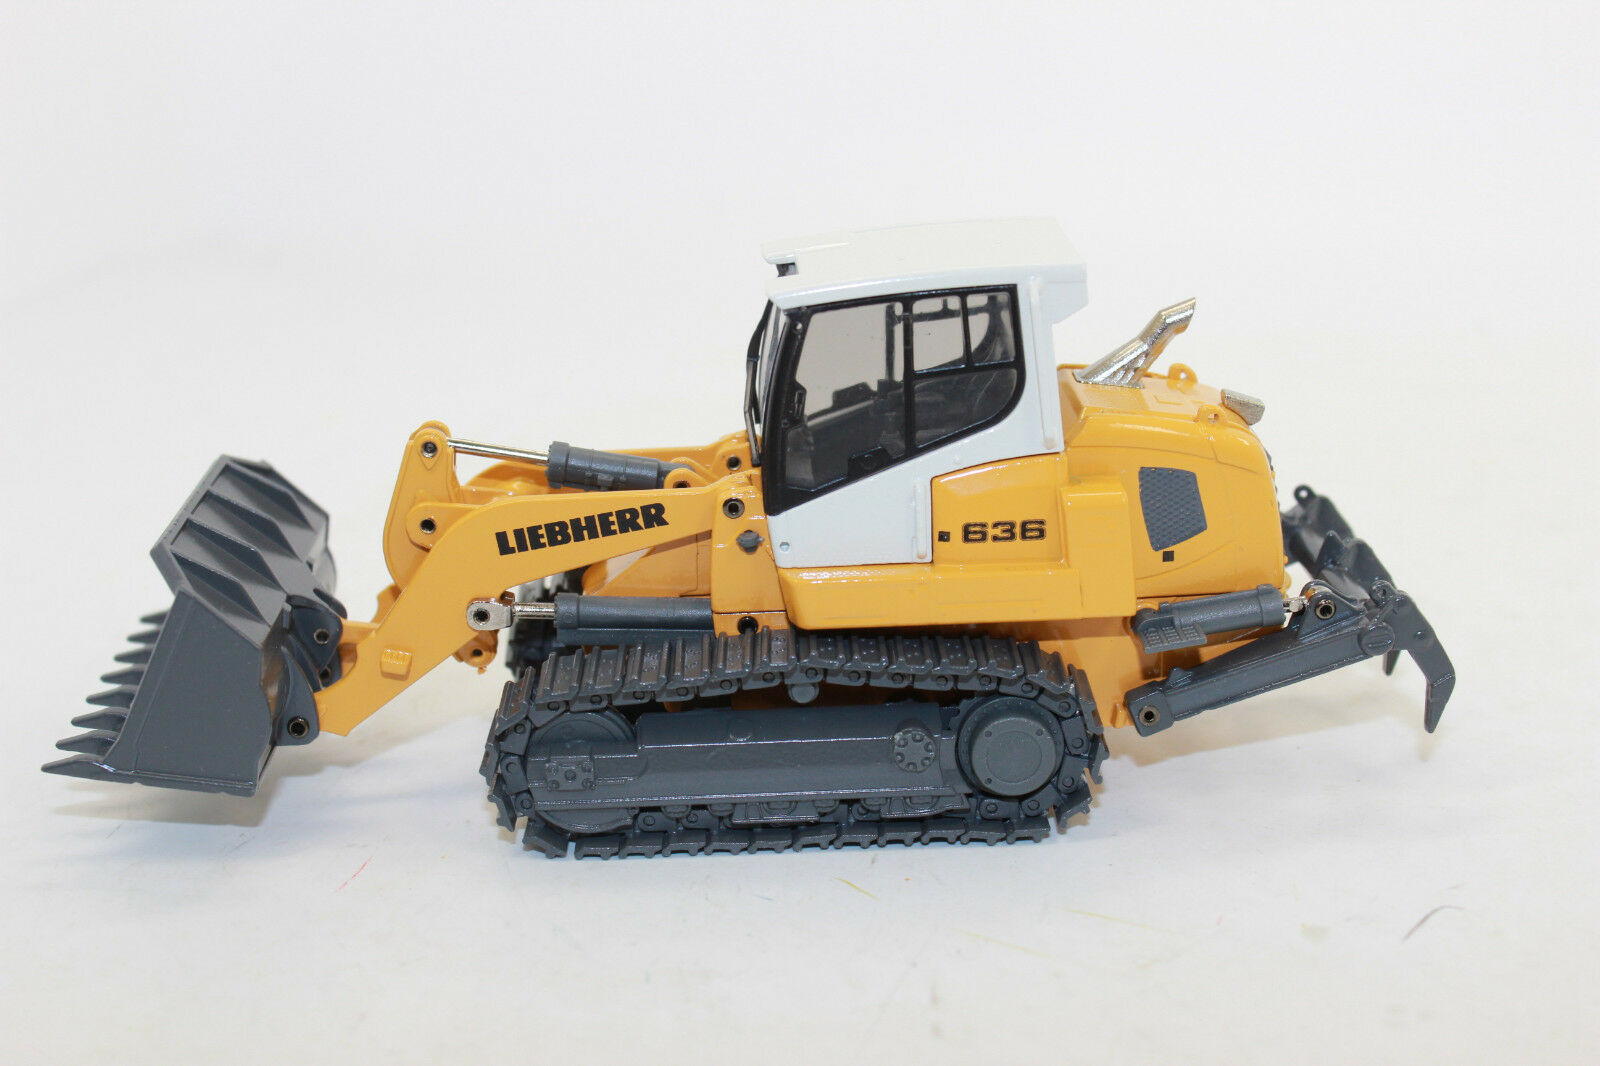 Conrad 2855 LIEBHERR laderaupe LR 636 neuve dans emballage d'origine 1 50